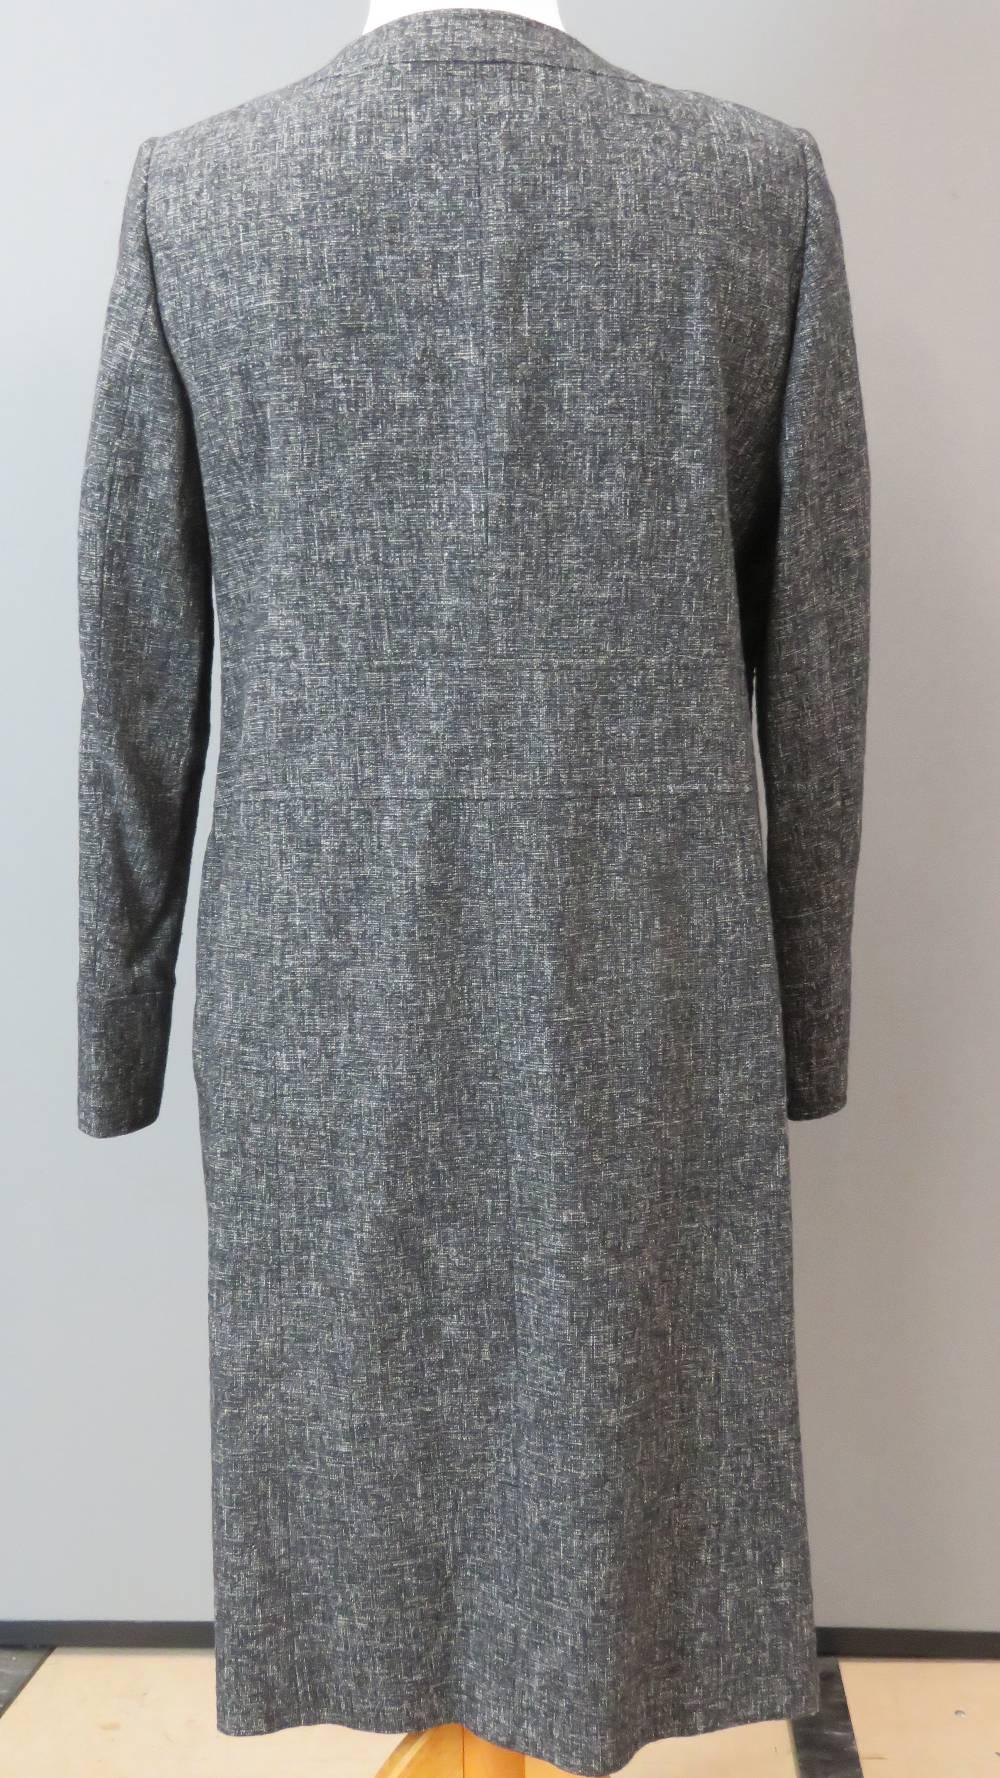 A ladies 3/4 length cotton jacket Windsm - Image 2 of 4